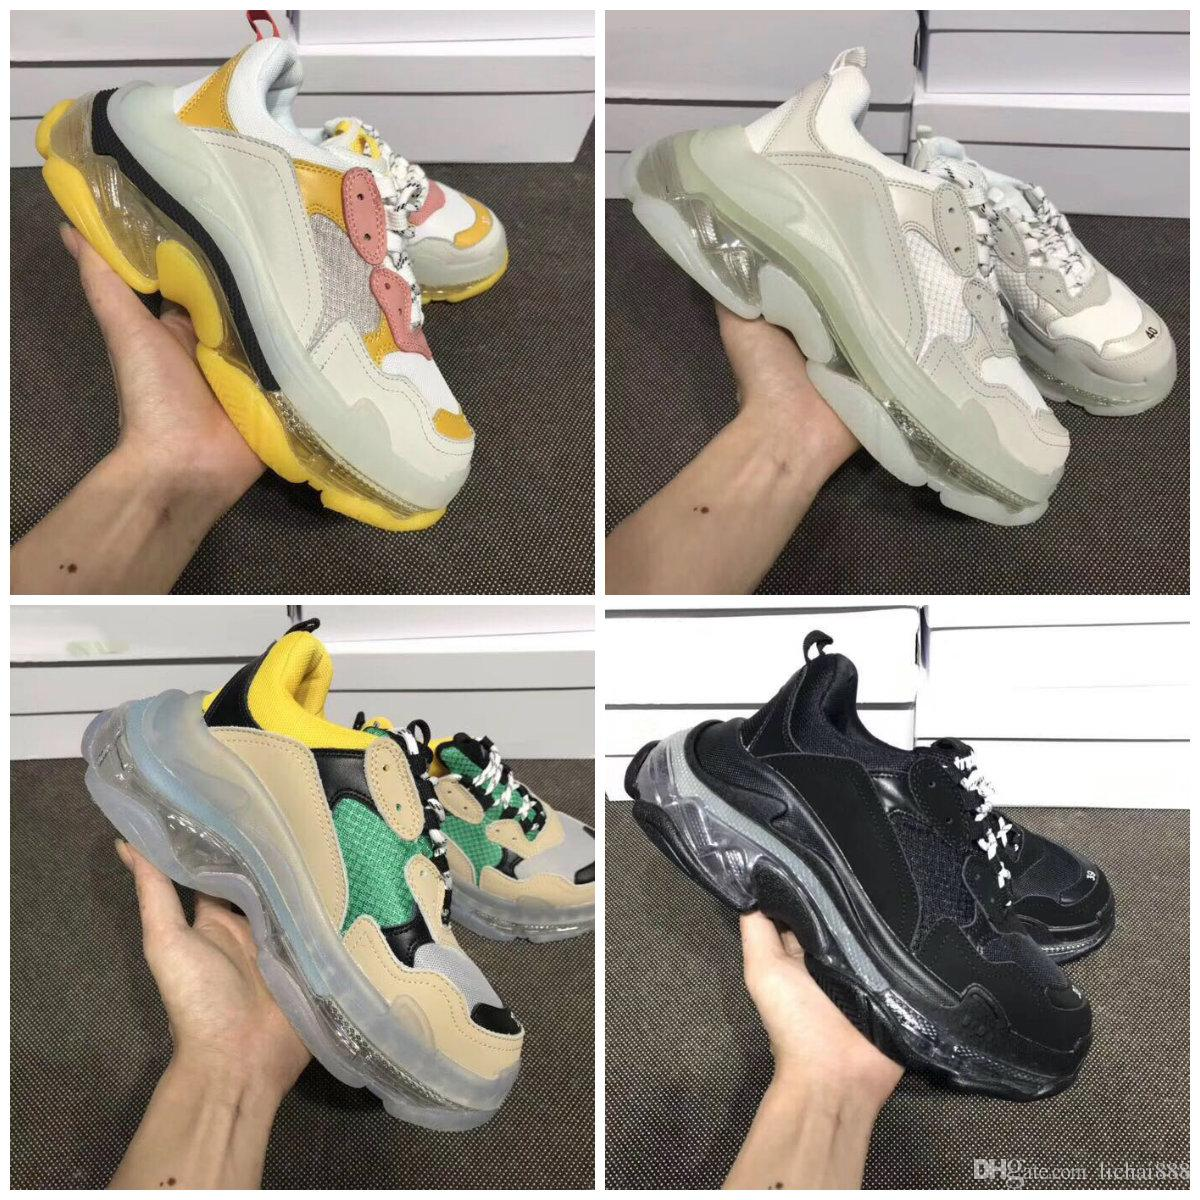 New hots ales 2019 mens femmes luxe designer sneakers Bowling Chaussures tess rue chaussure de mode casual chaussures de sport automne printemps baskets